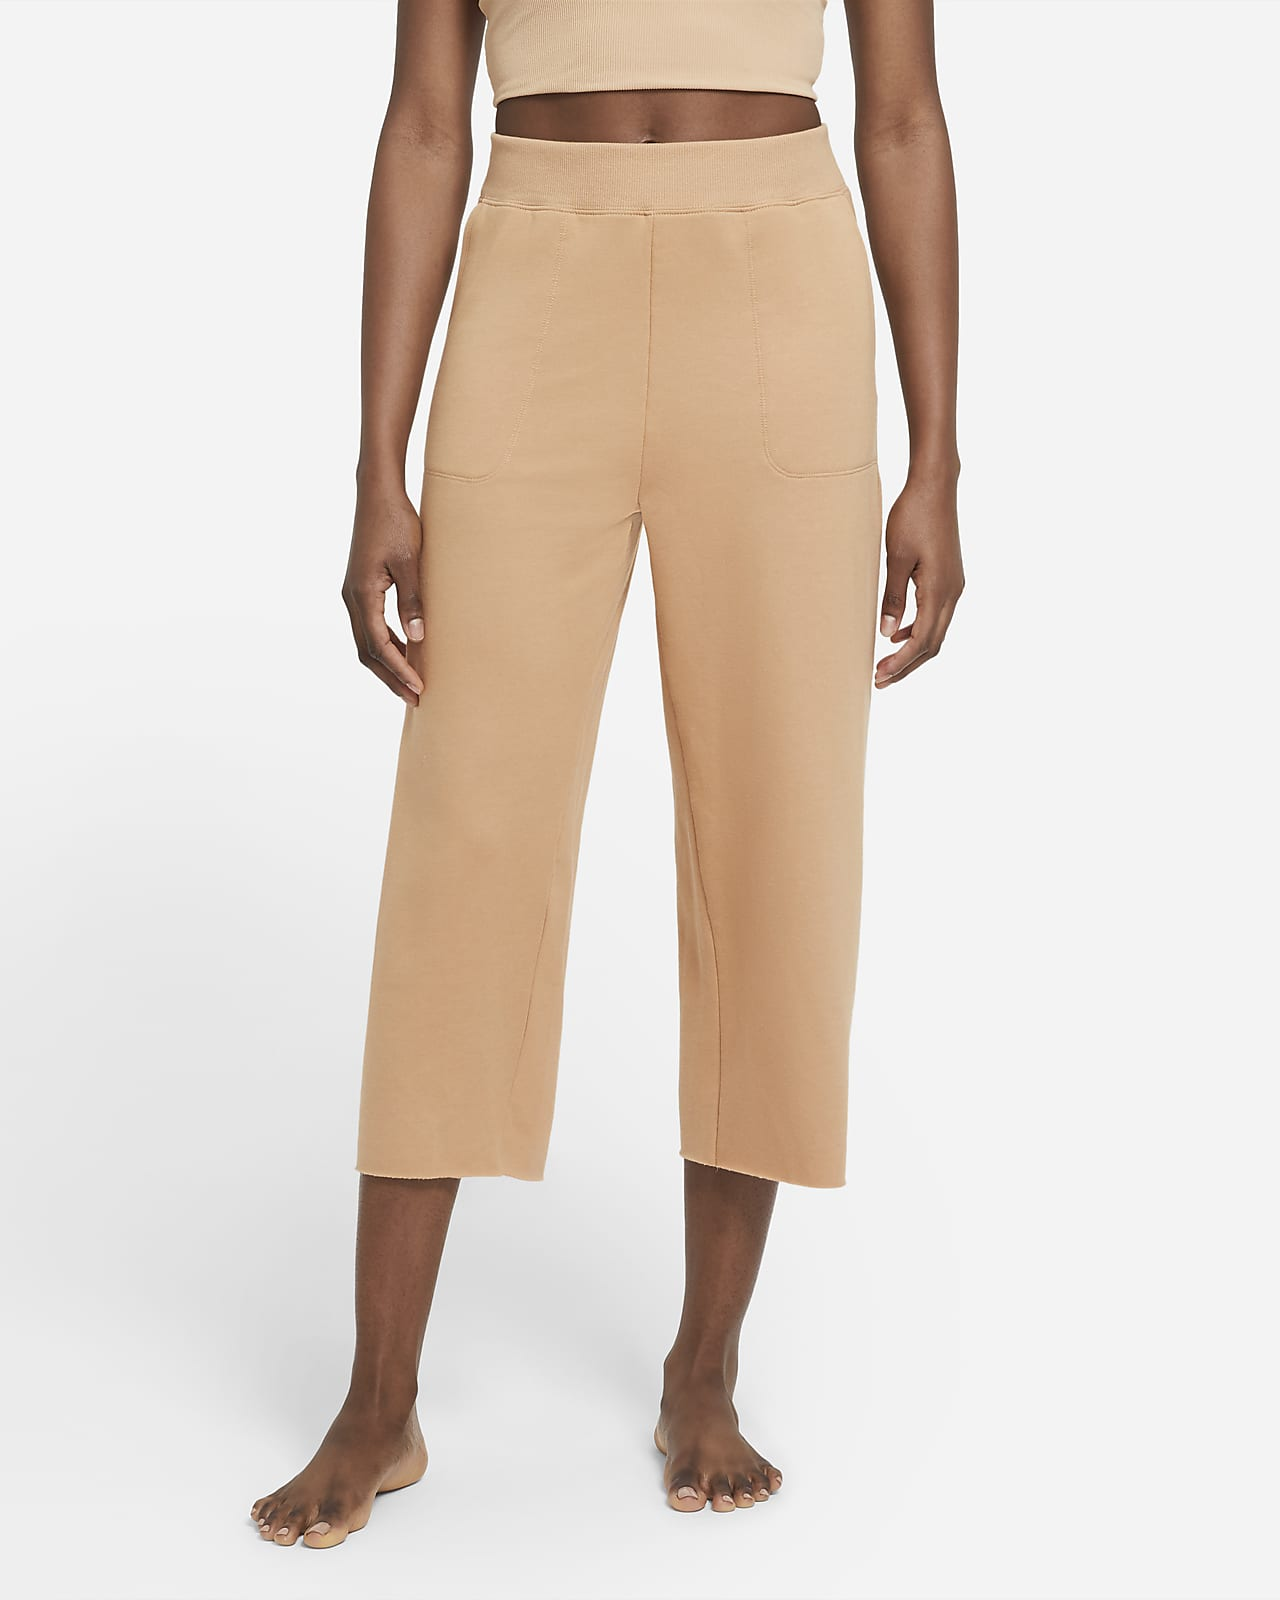 Nike Yoga Luxe kort fleecebukse til dame